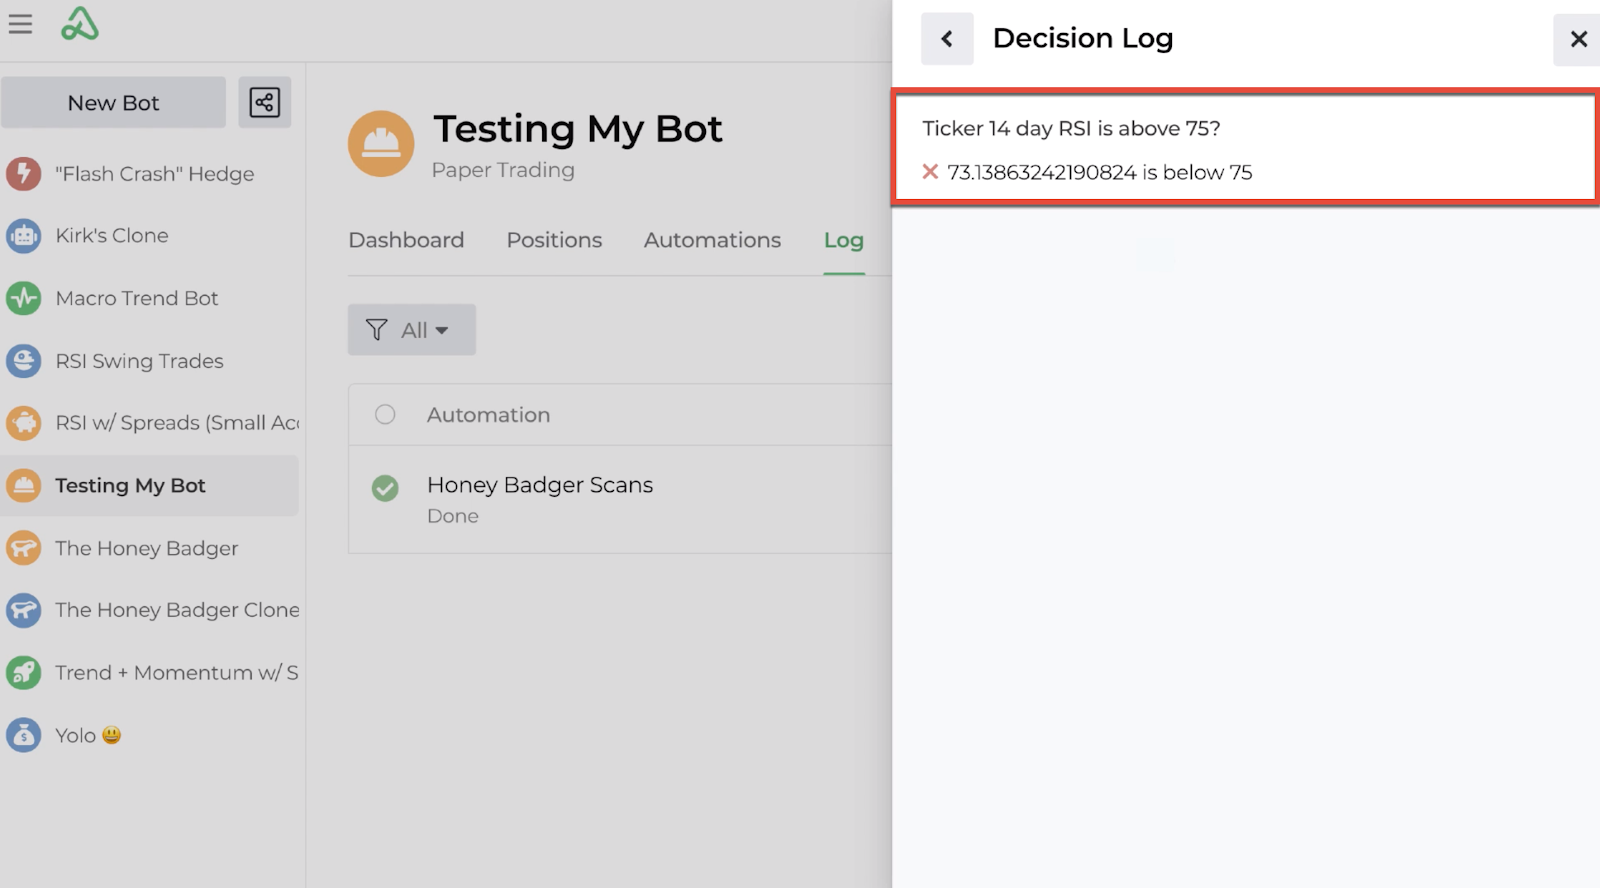 Screenshot highlighting the decision log display